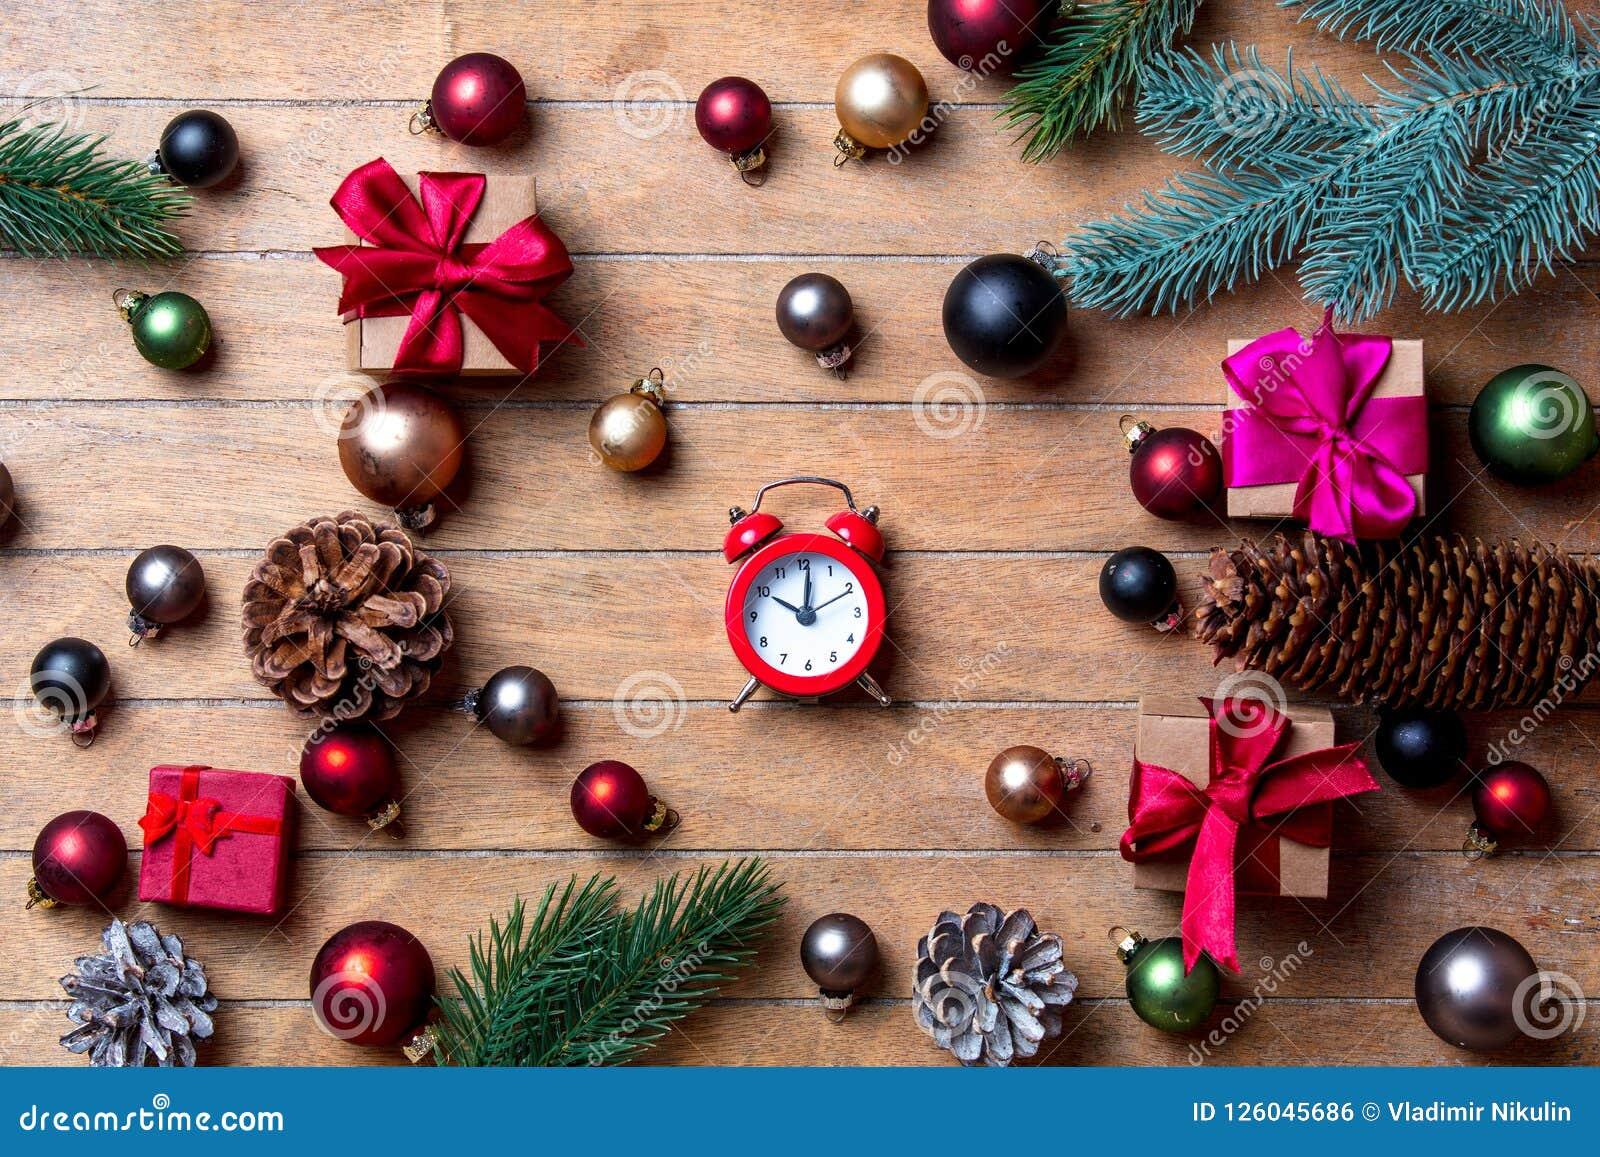 Alarm Clock With Christmas Decoration Stock Photo - Image ...